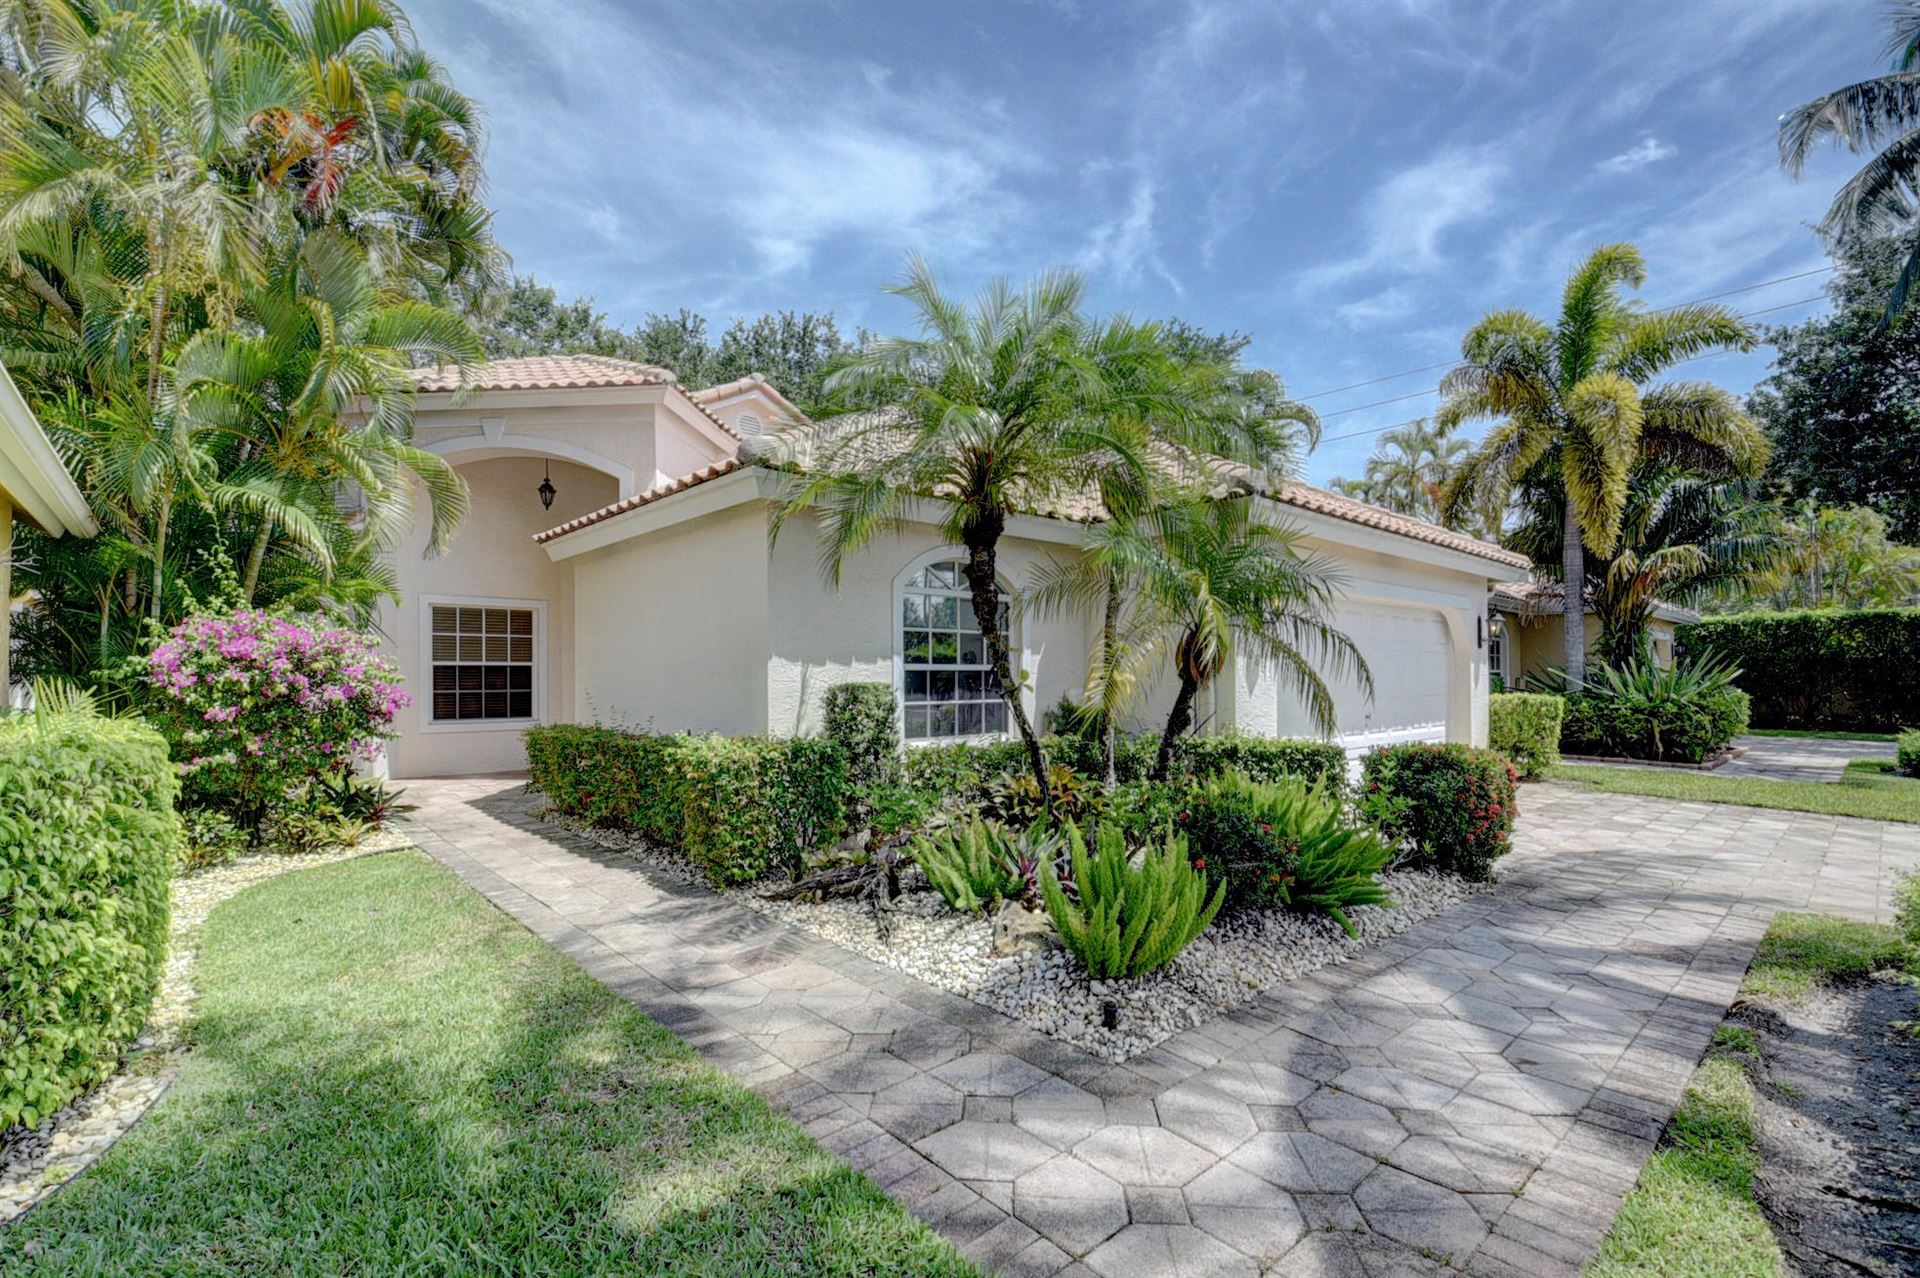 11086 Springbrook Circle, Boynton Beach, FL 33437 - MLS#: RX-10713730